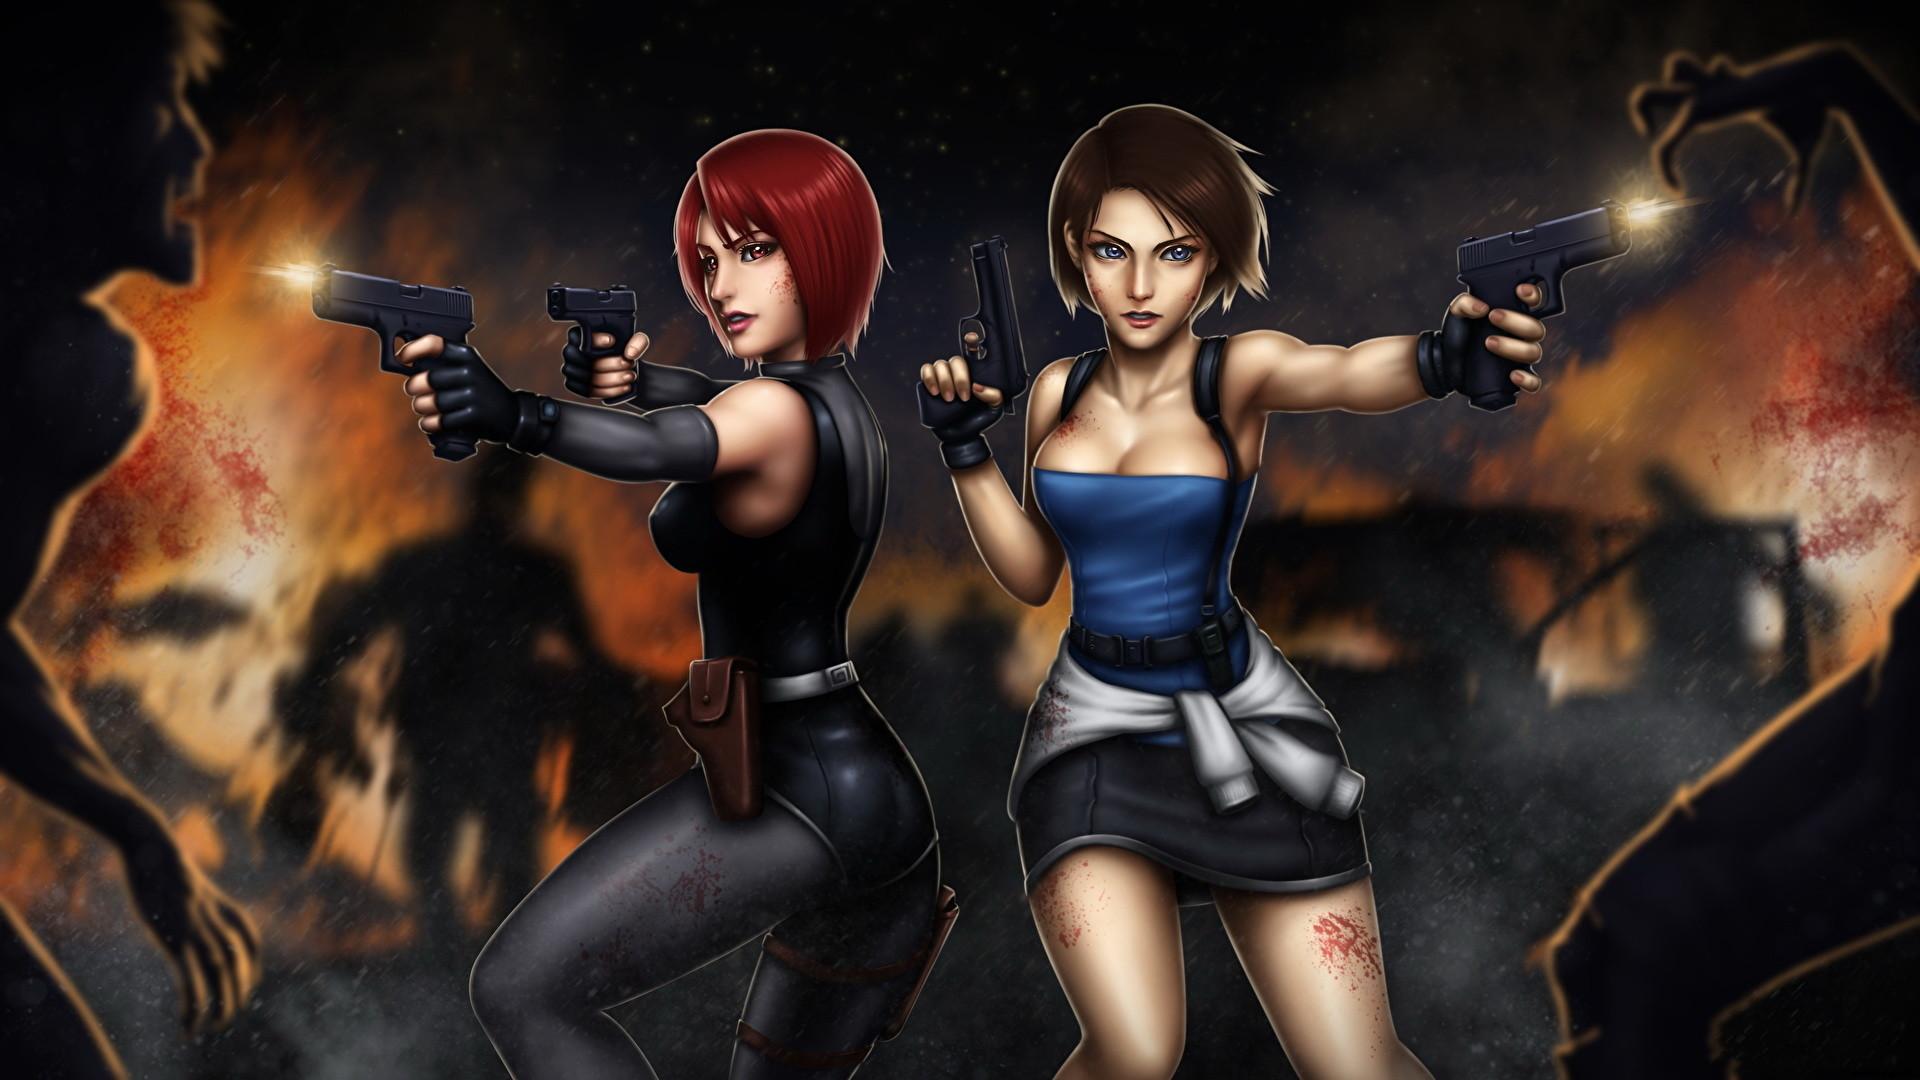 Wallpaper Resident Evil Zombie Firing Pistols Redhead girl Brown haired 3,  Regina, Jill Valentine